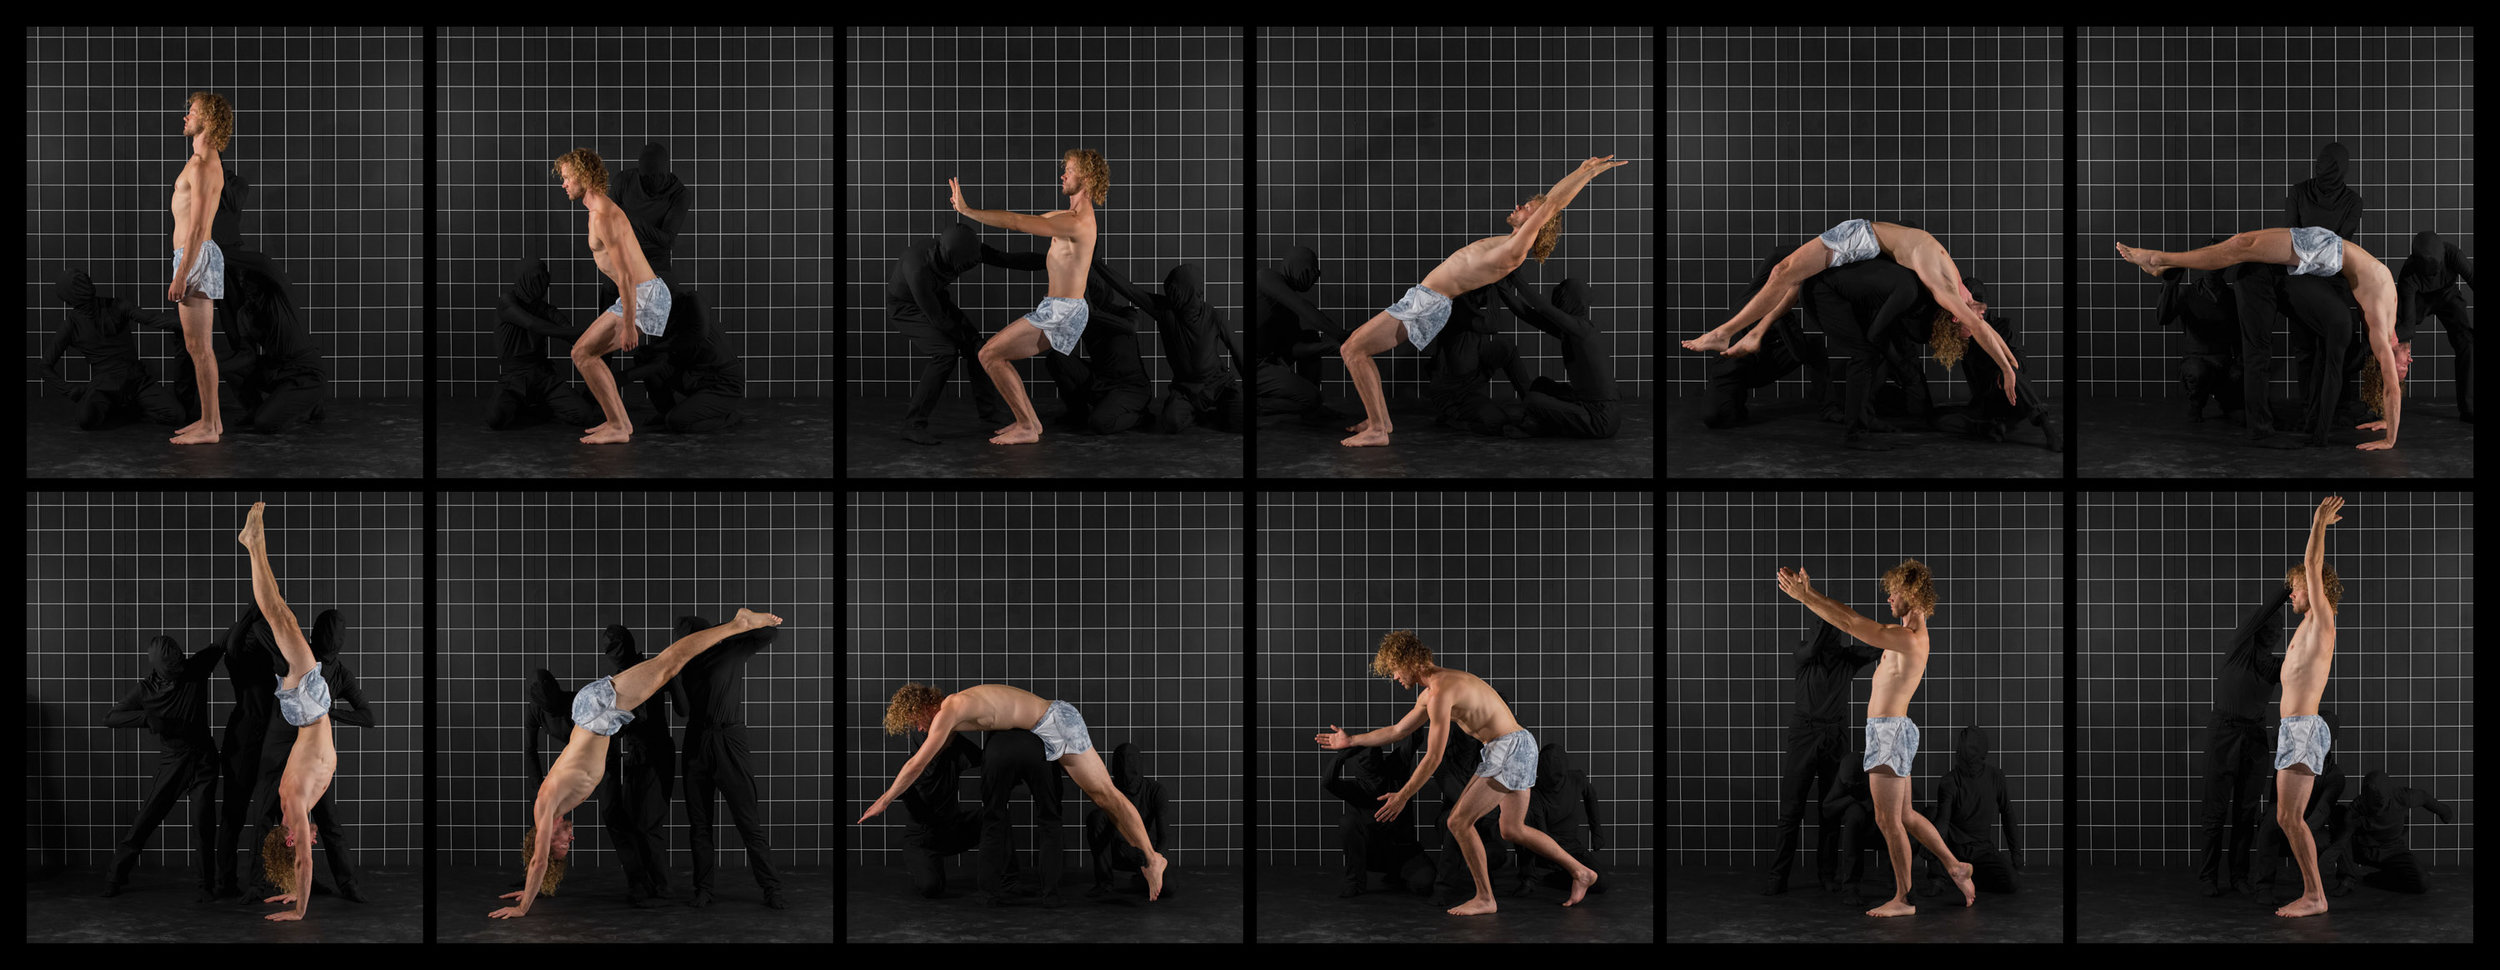 "After Muybridge (Back Handspring 2)  2016, archival pigment print 46.5 x 119.5 cm (18.25"" x 47"")  93 x 239 cm (36.5"" x 94"") Editions of 2"